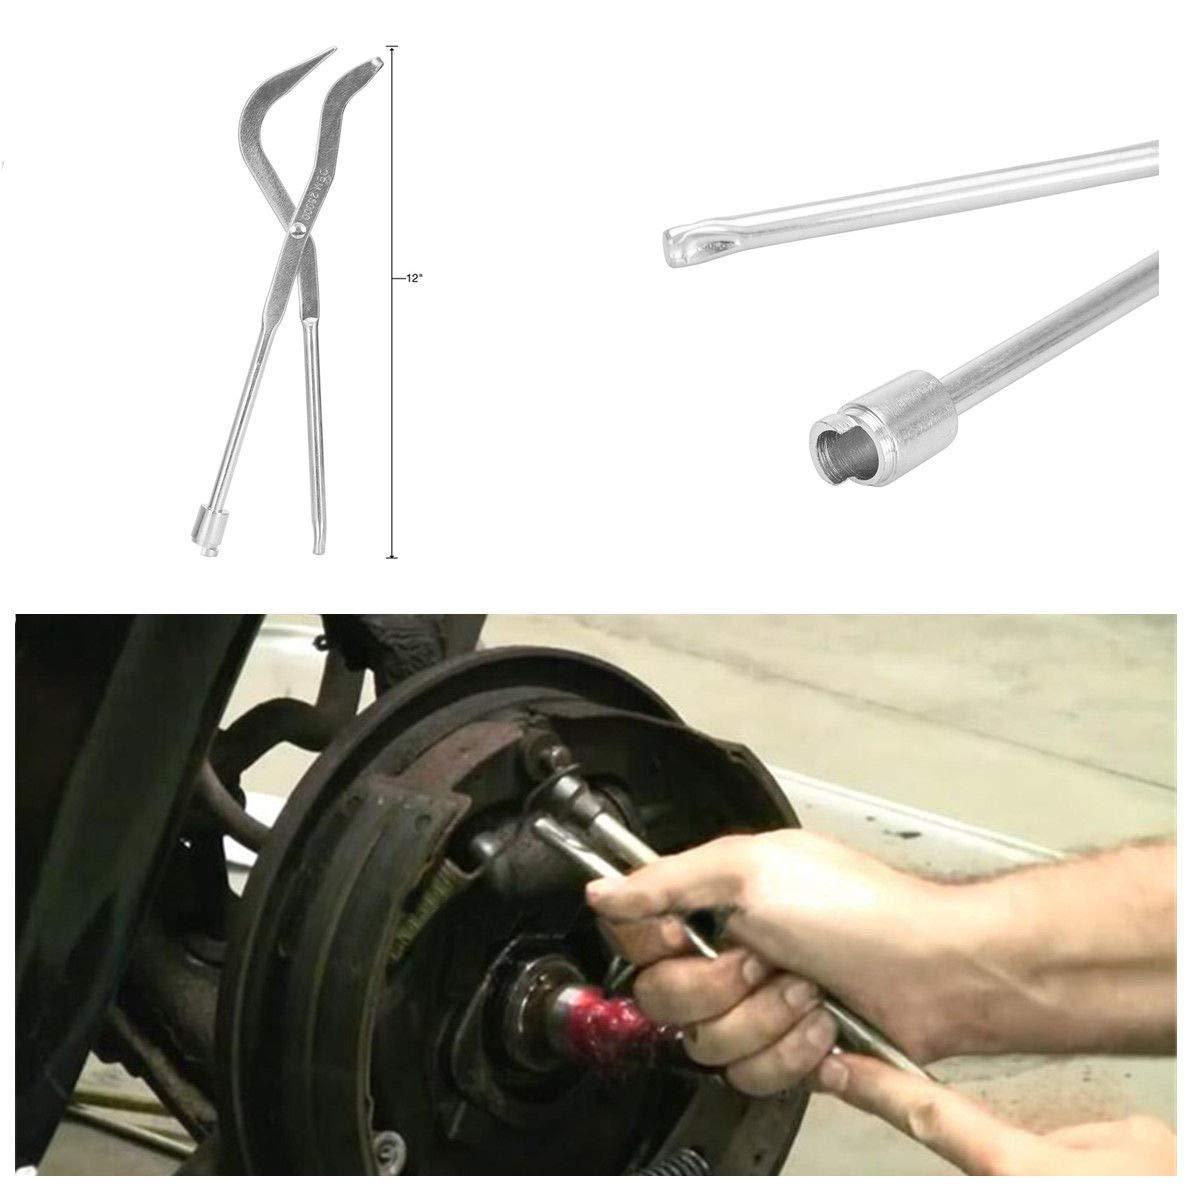 BEEAUTO 1X Brake Spring Plier Car Repair Brake Plier Garage Workshop Professional Tools